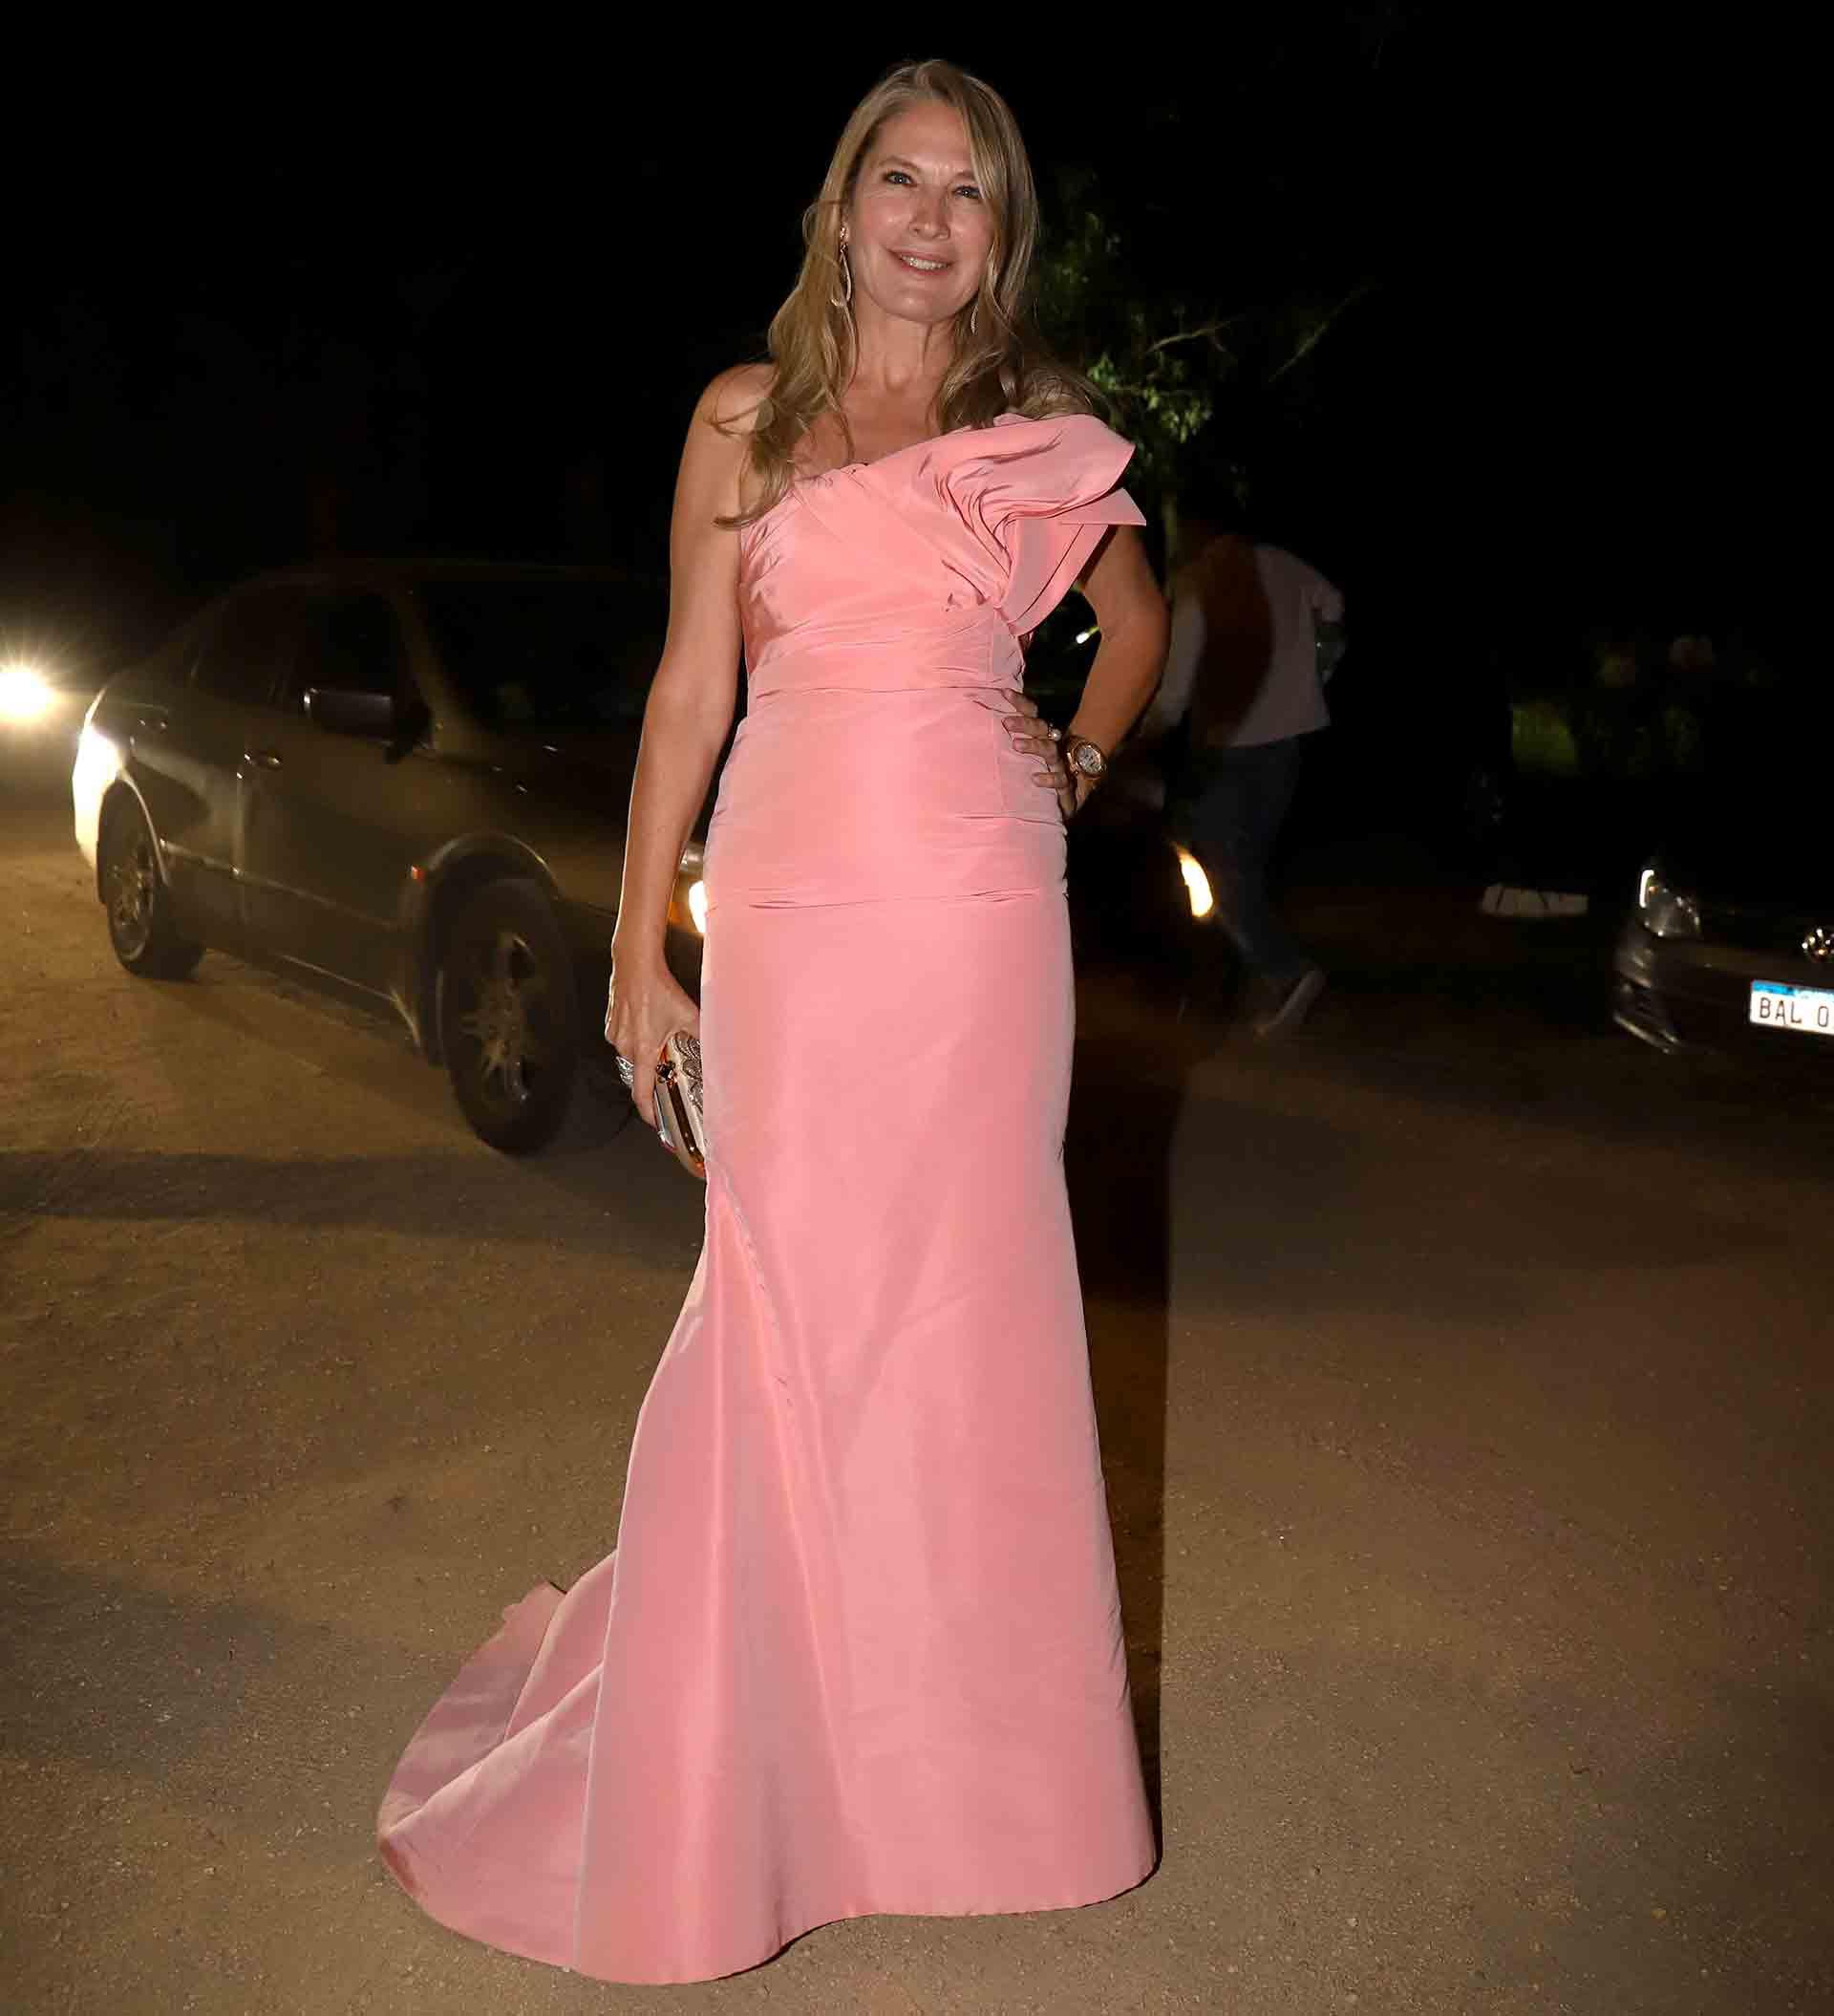 Ana Rusconi